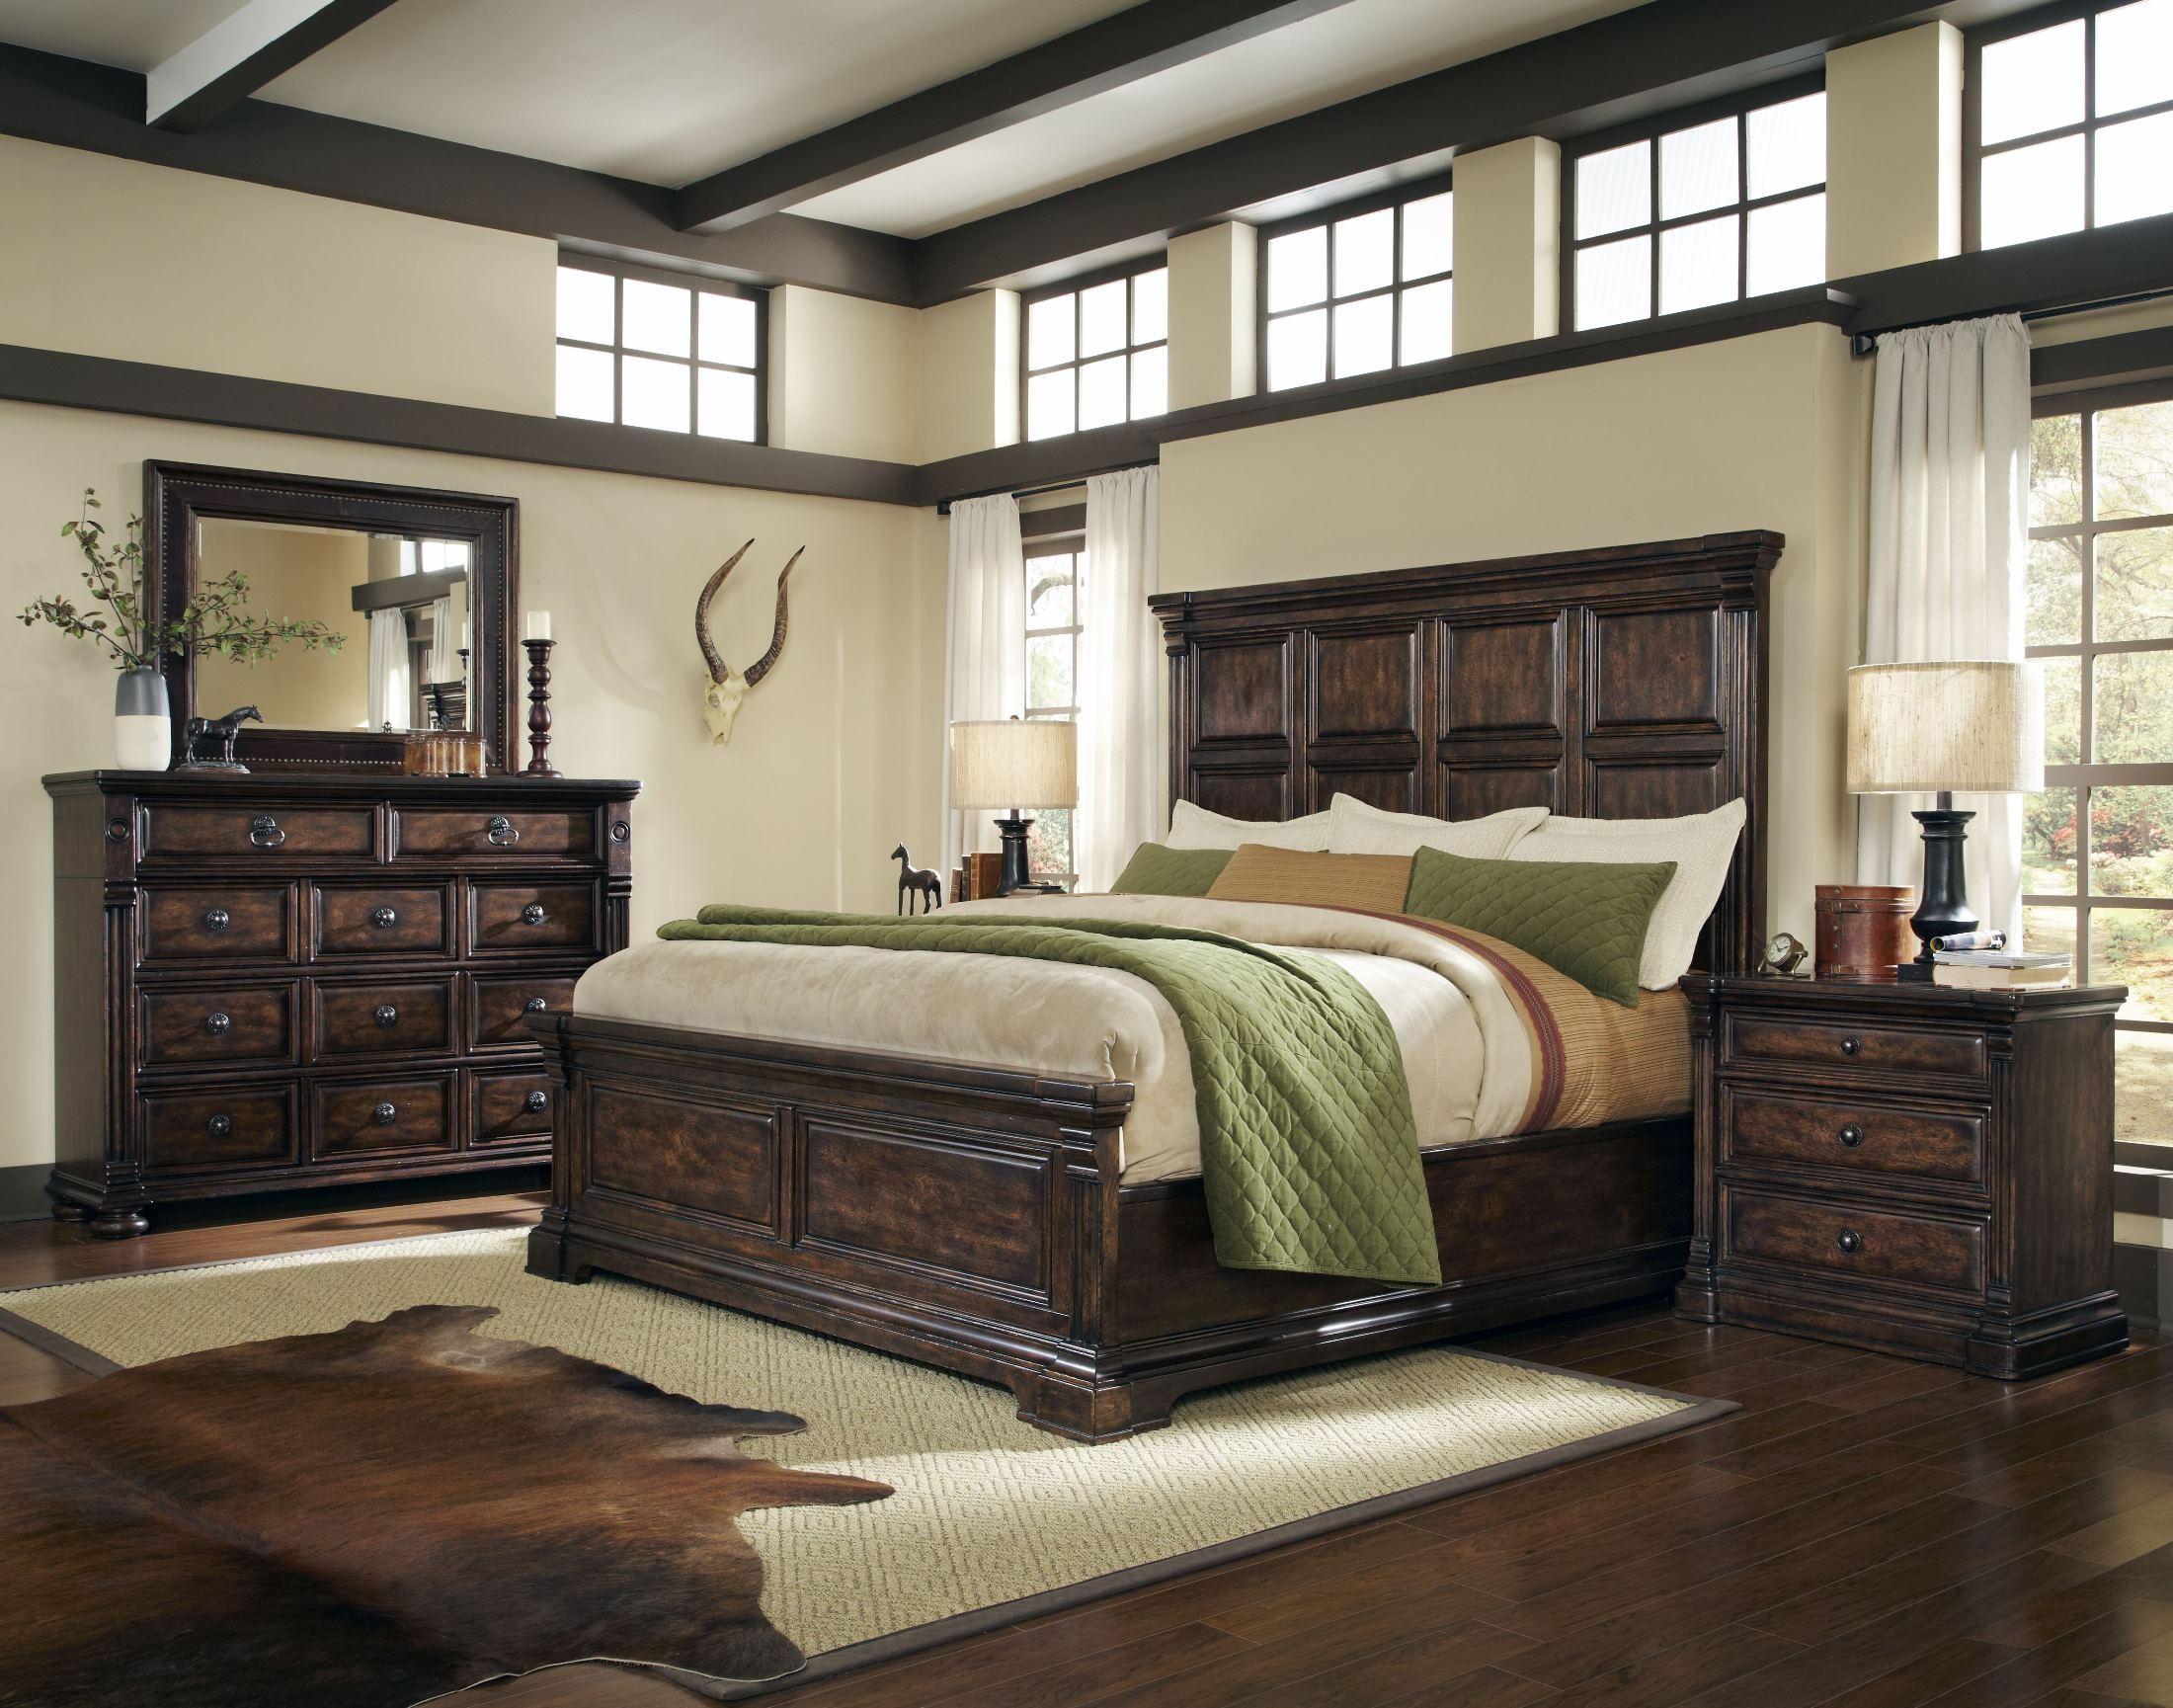 4 Piece Modus Kentfield Solid Wood Bedroom Set: Whiskey Barrel Oak Panel Bedroom Set From ART (205126-2304